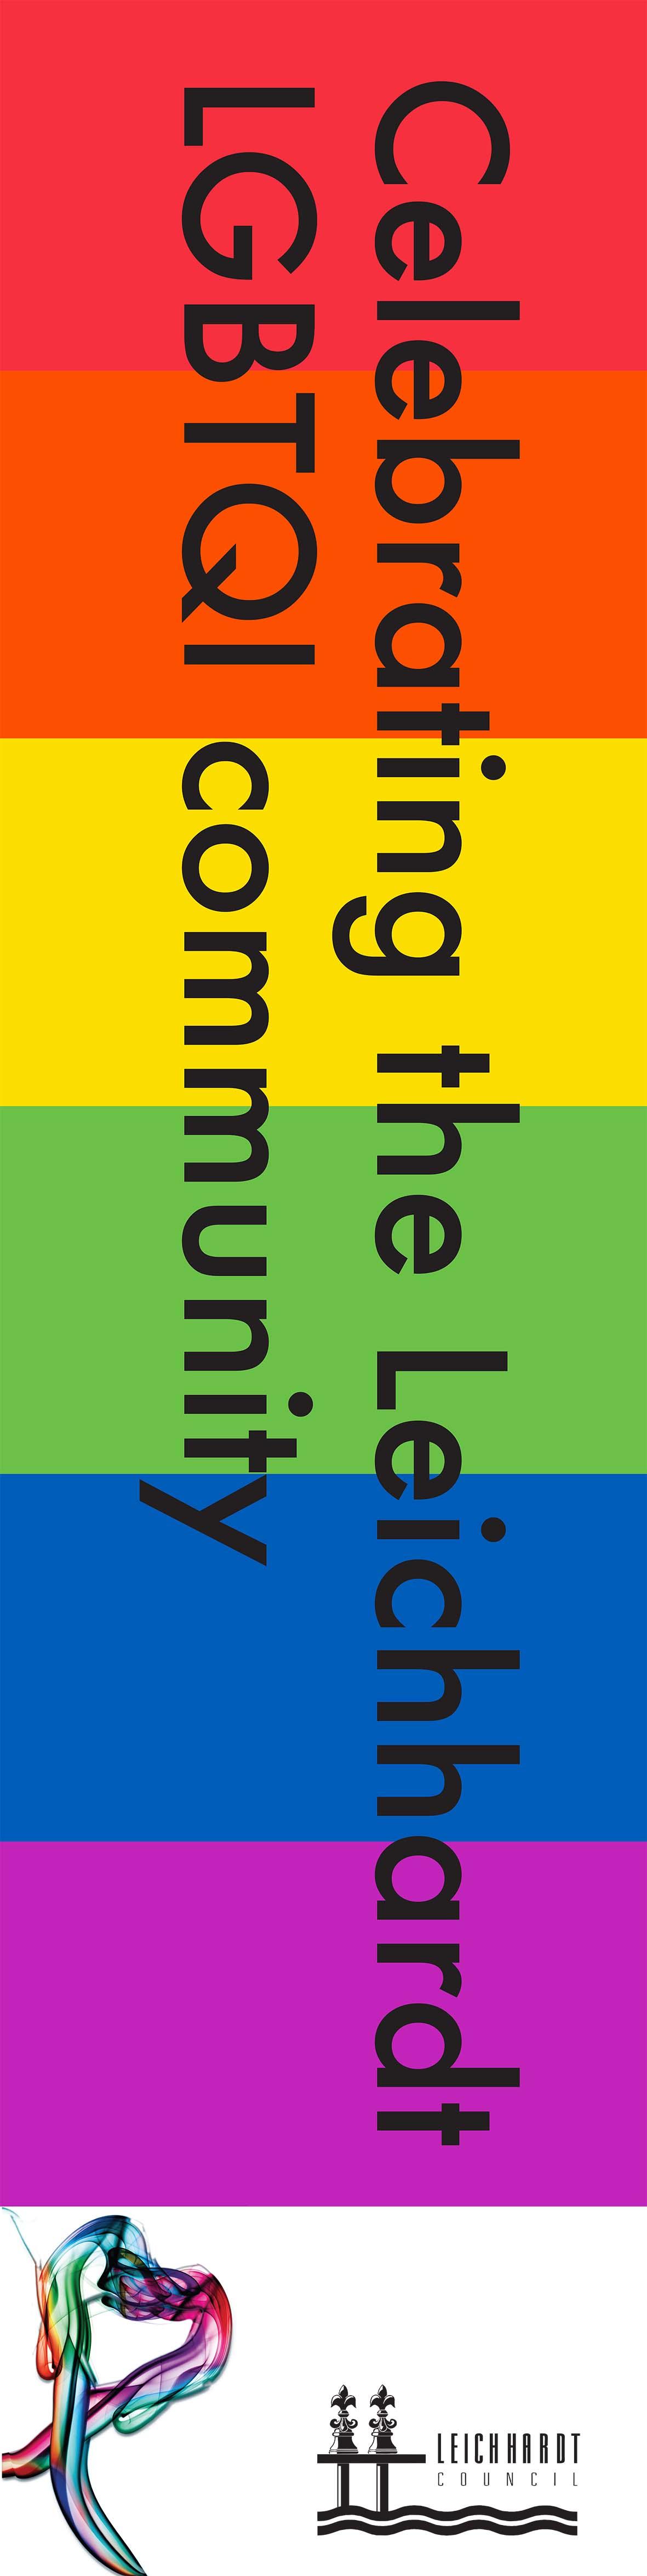 final_3SelbyFabric Flag bannerall heart_LGBTQICommunity